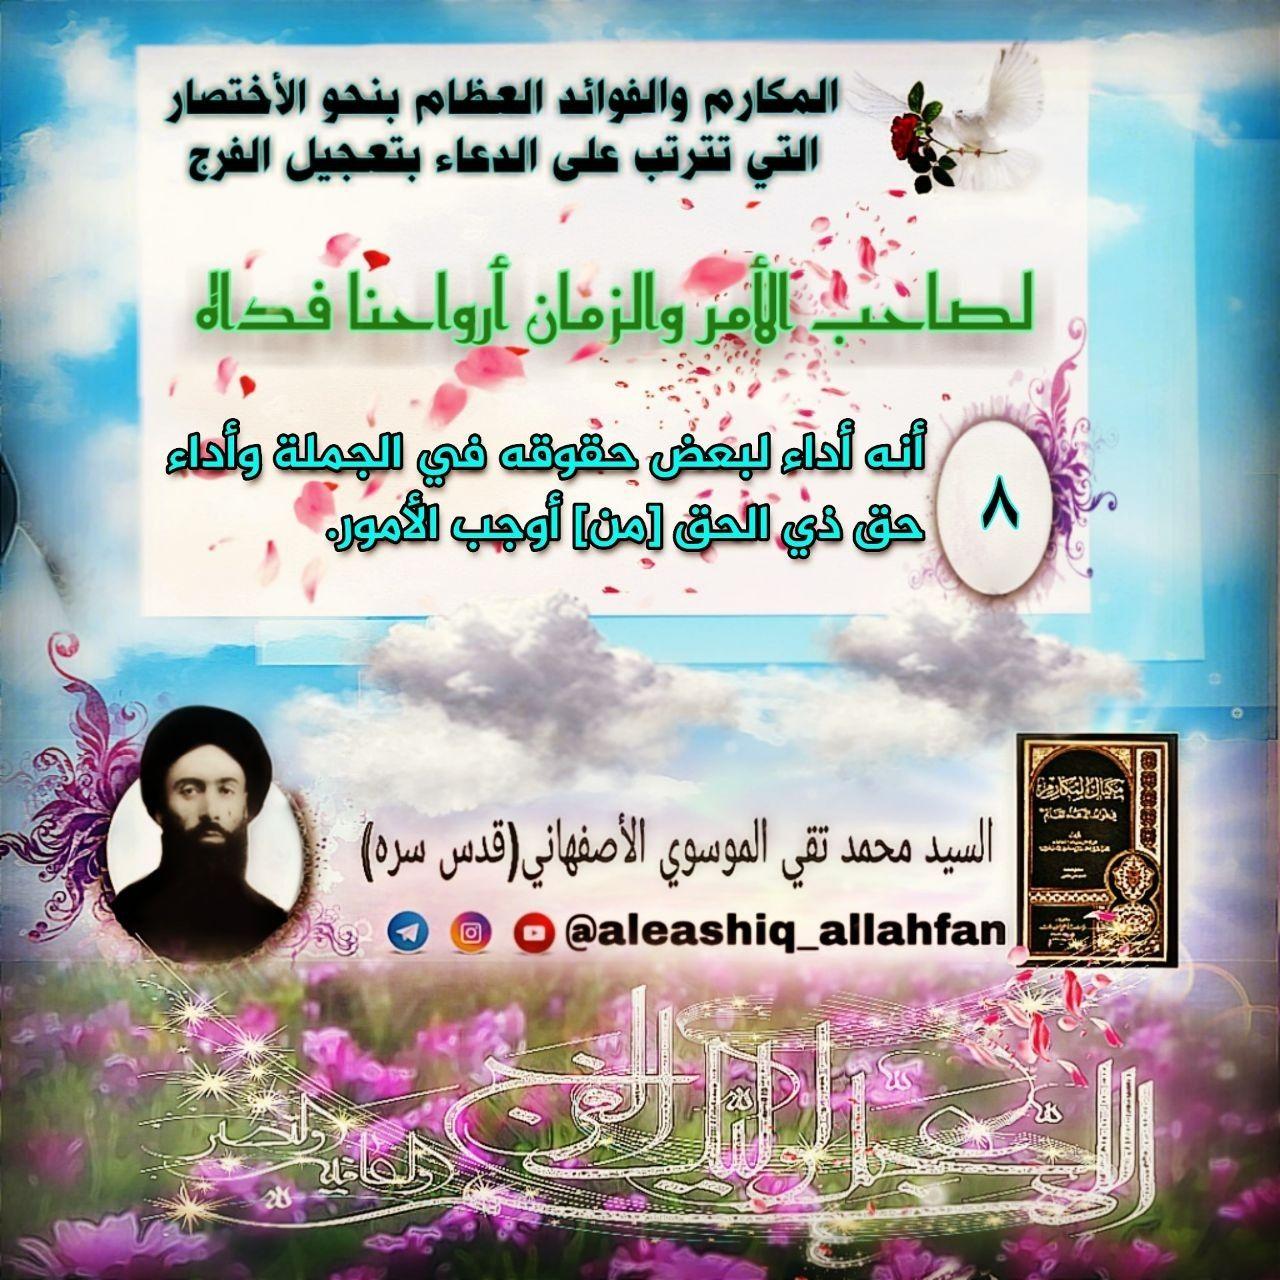 Pin By السيد محمد تقي الاصفهاني Aleas On اللهم عجل لوليك الفرج In 2020 Book Cover Books Poster